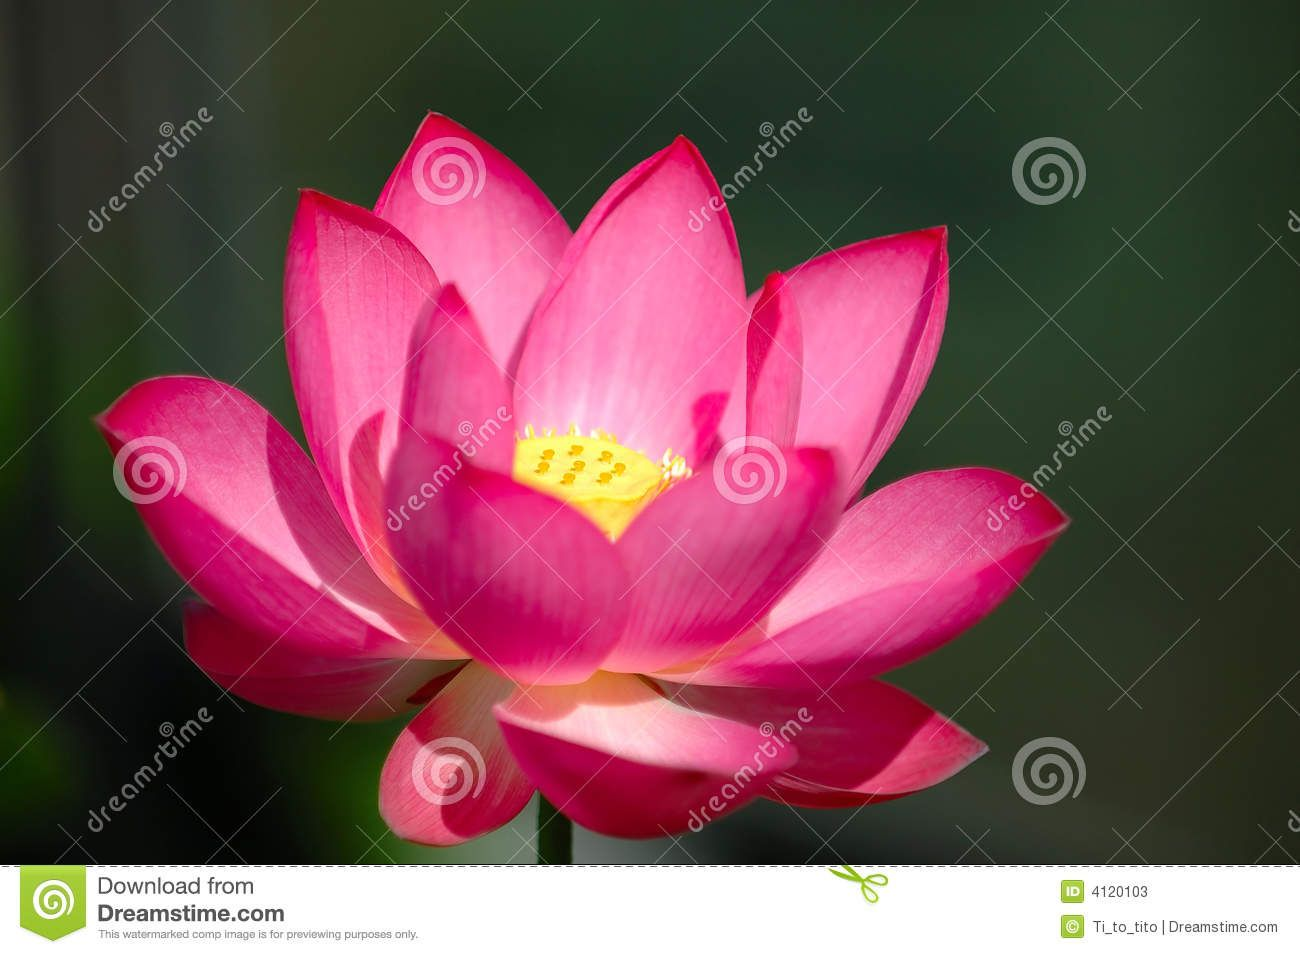 The blooming pink lotus flower stock photos image 4120103 the blooming pink lotus flower stock photos image 4120103 izmirmasajfo